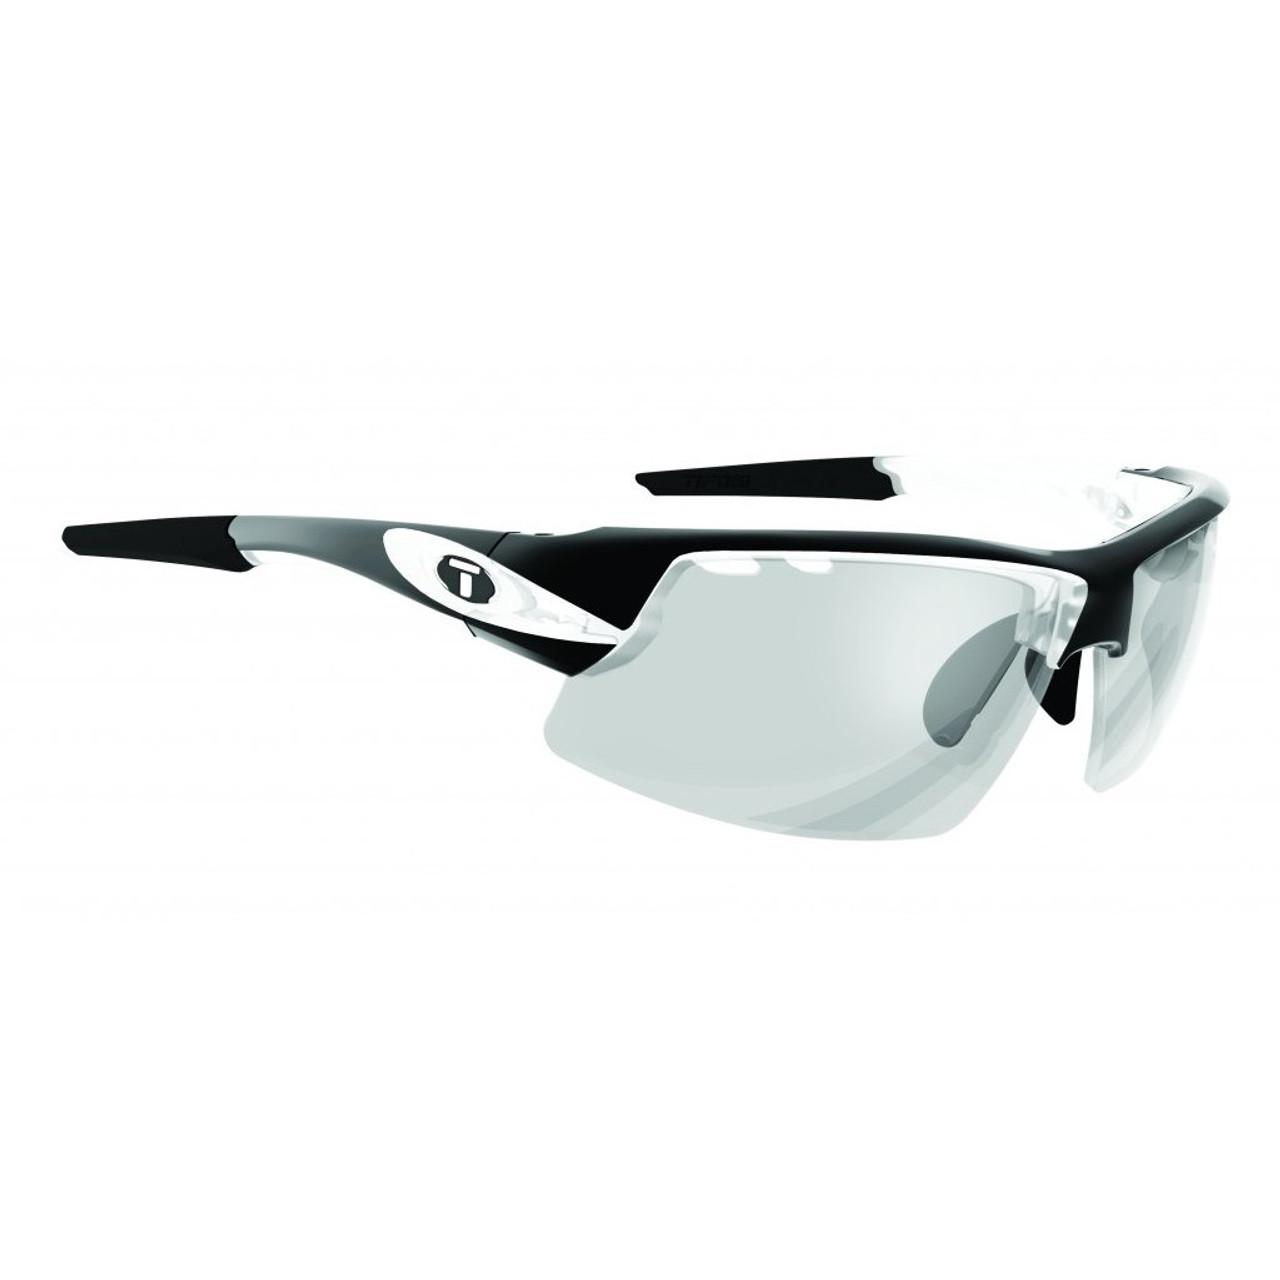 f58e33ed831 Tifosi Optics Crit Sunglasses with Light Night Fototec Lens